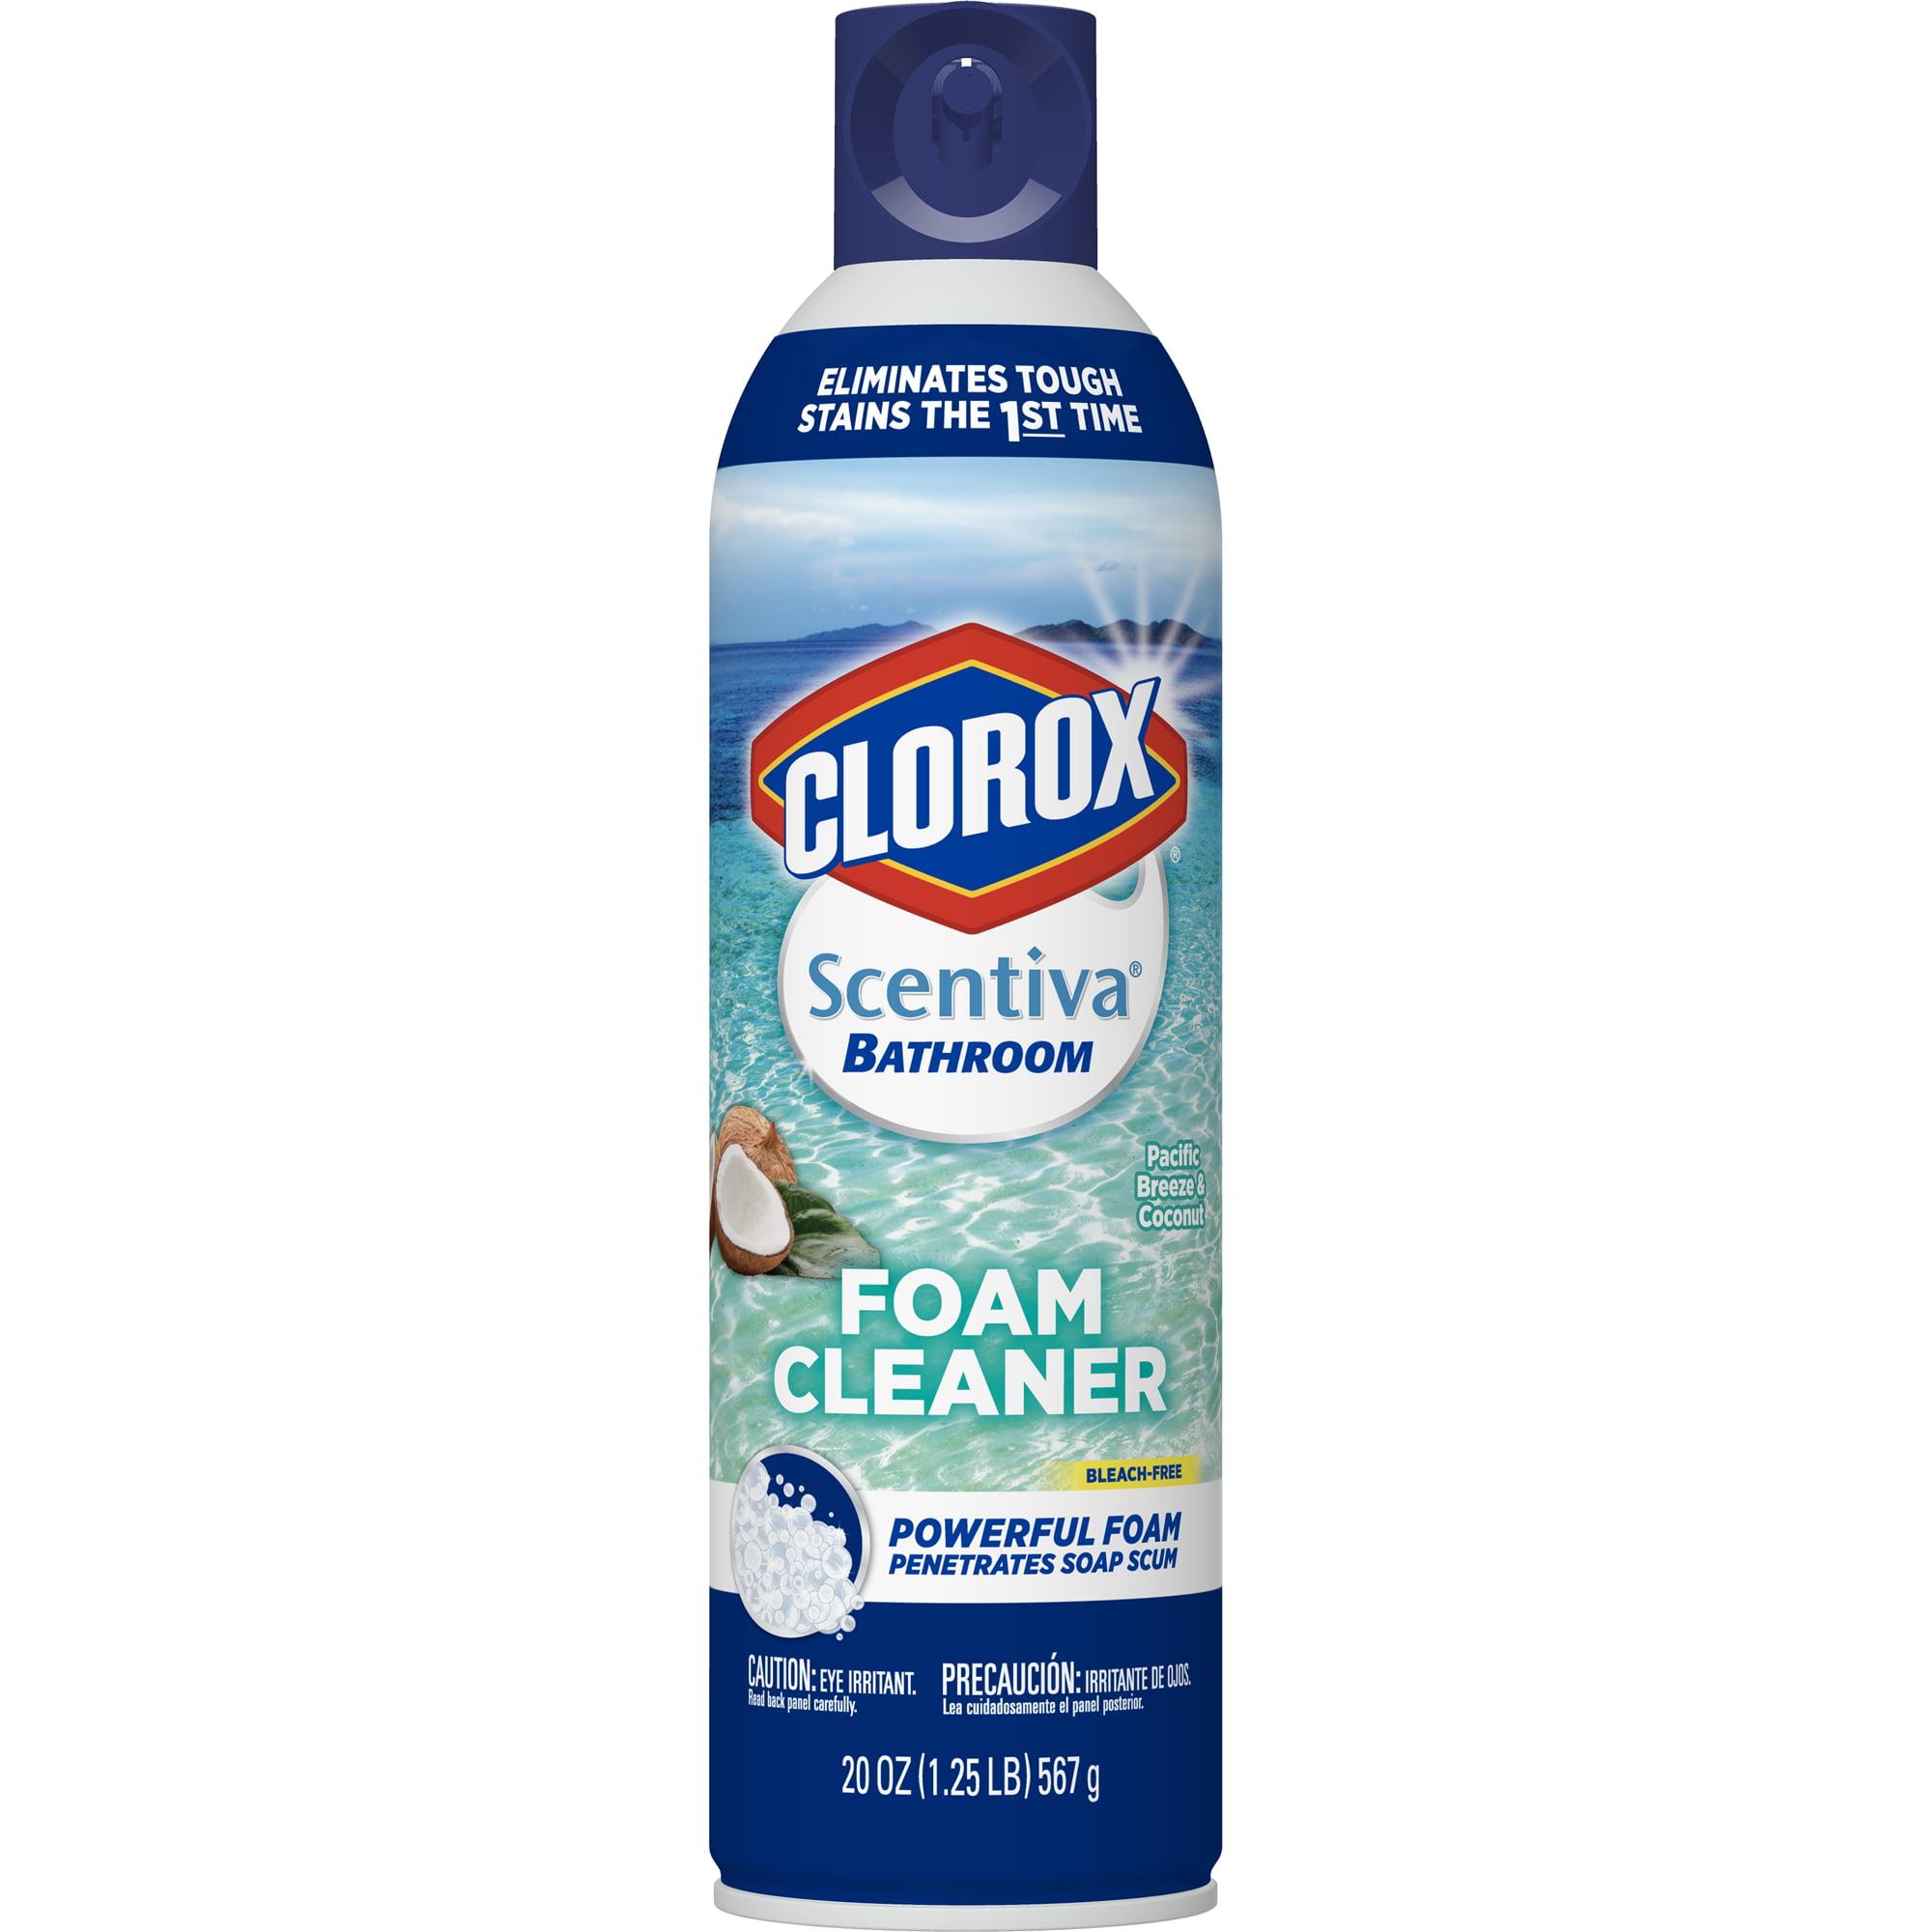 Clorox Scentiva Bathroom Foam Cleaner - Foaming Aerosol Multi ...